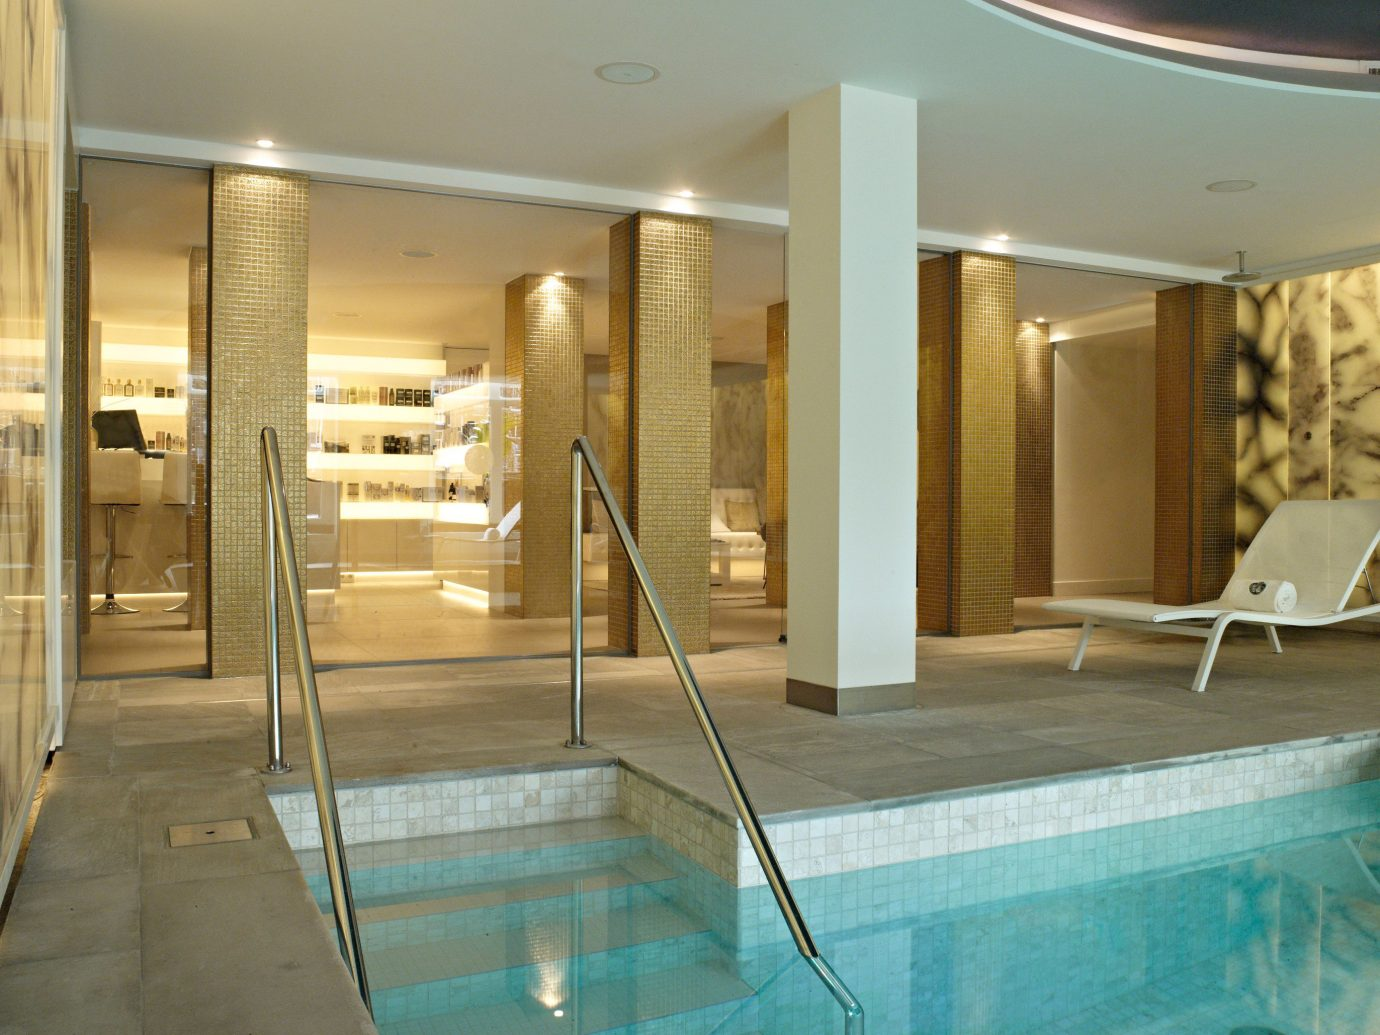 Amsterdam Hotels The Netherlands indoor floor swimming pool ceiling property room interior design lighting estate real estate condominium Design Lobby furniture